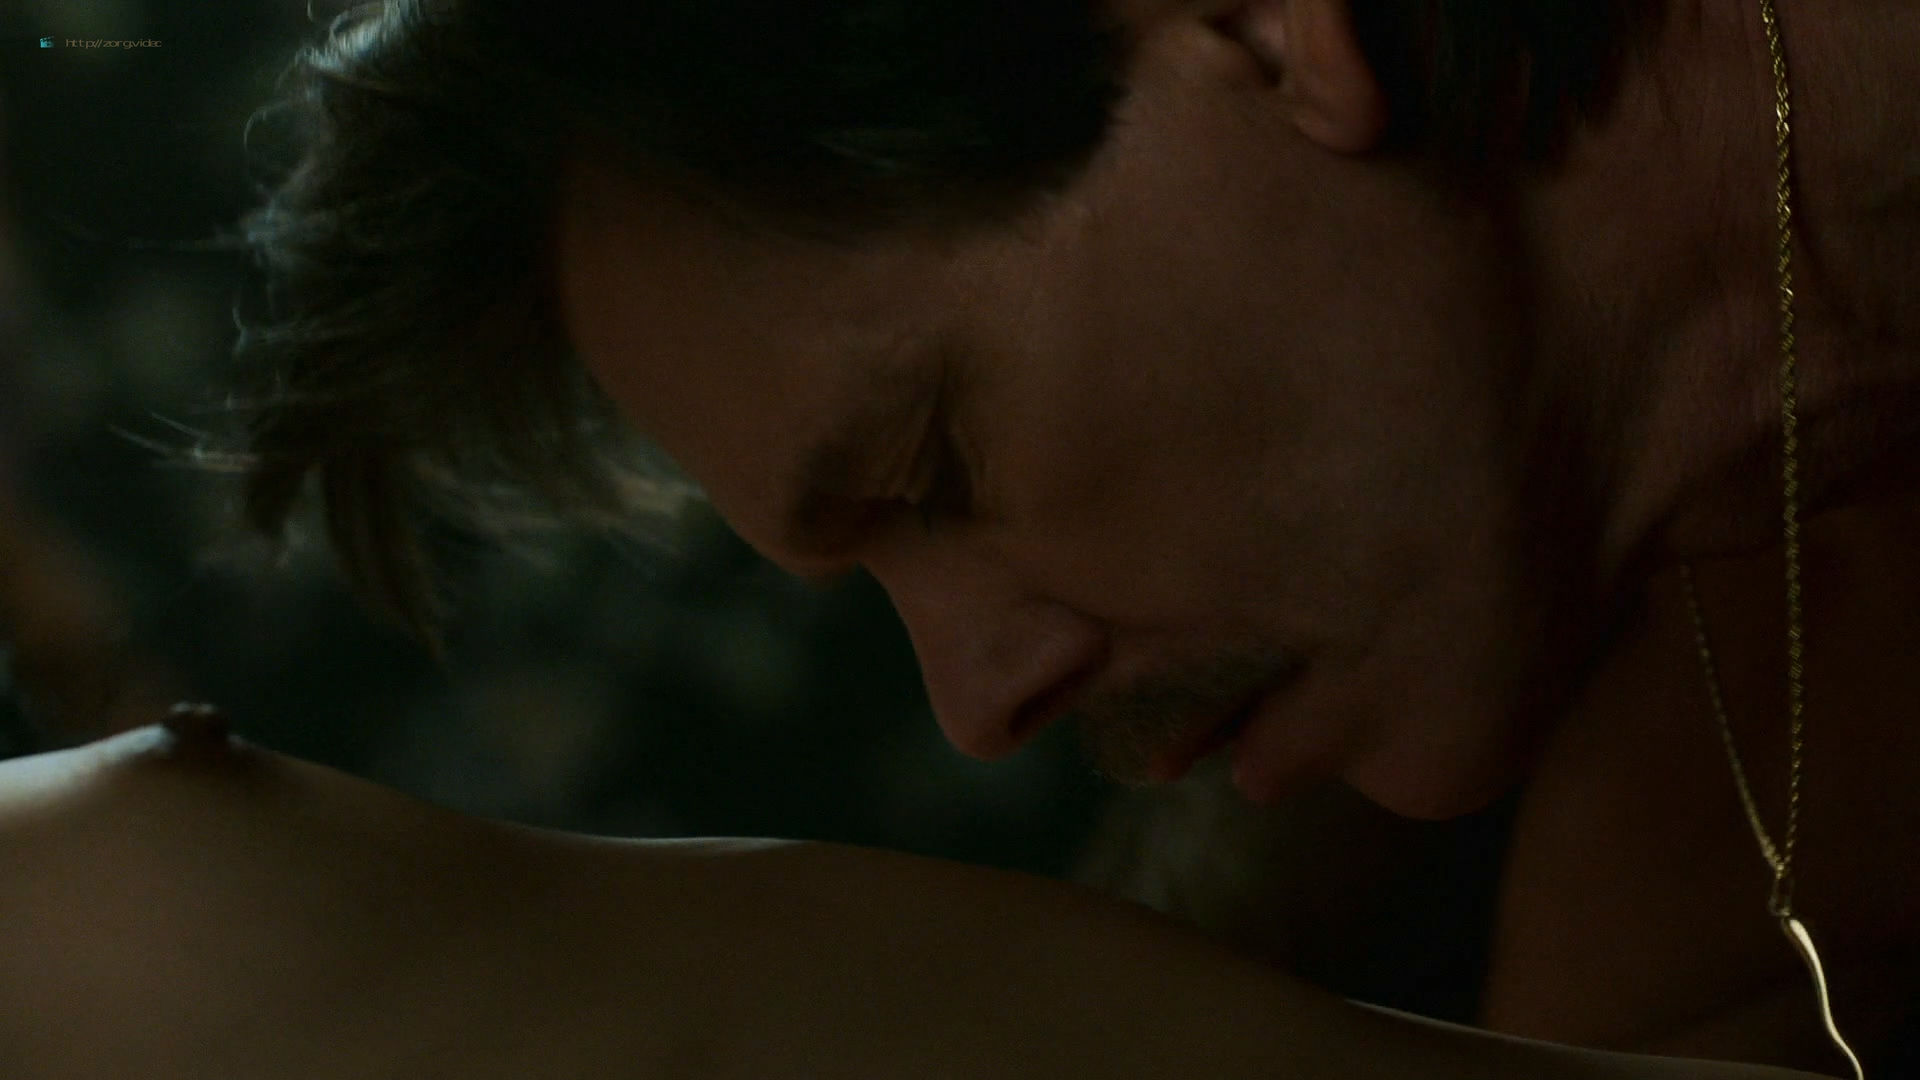 MaYaa Boateng nude topless in sex scene - City on a Hill (2019) s1e2 HD 1080p (7)